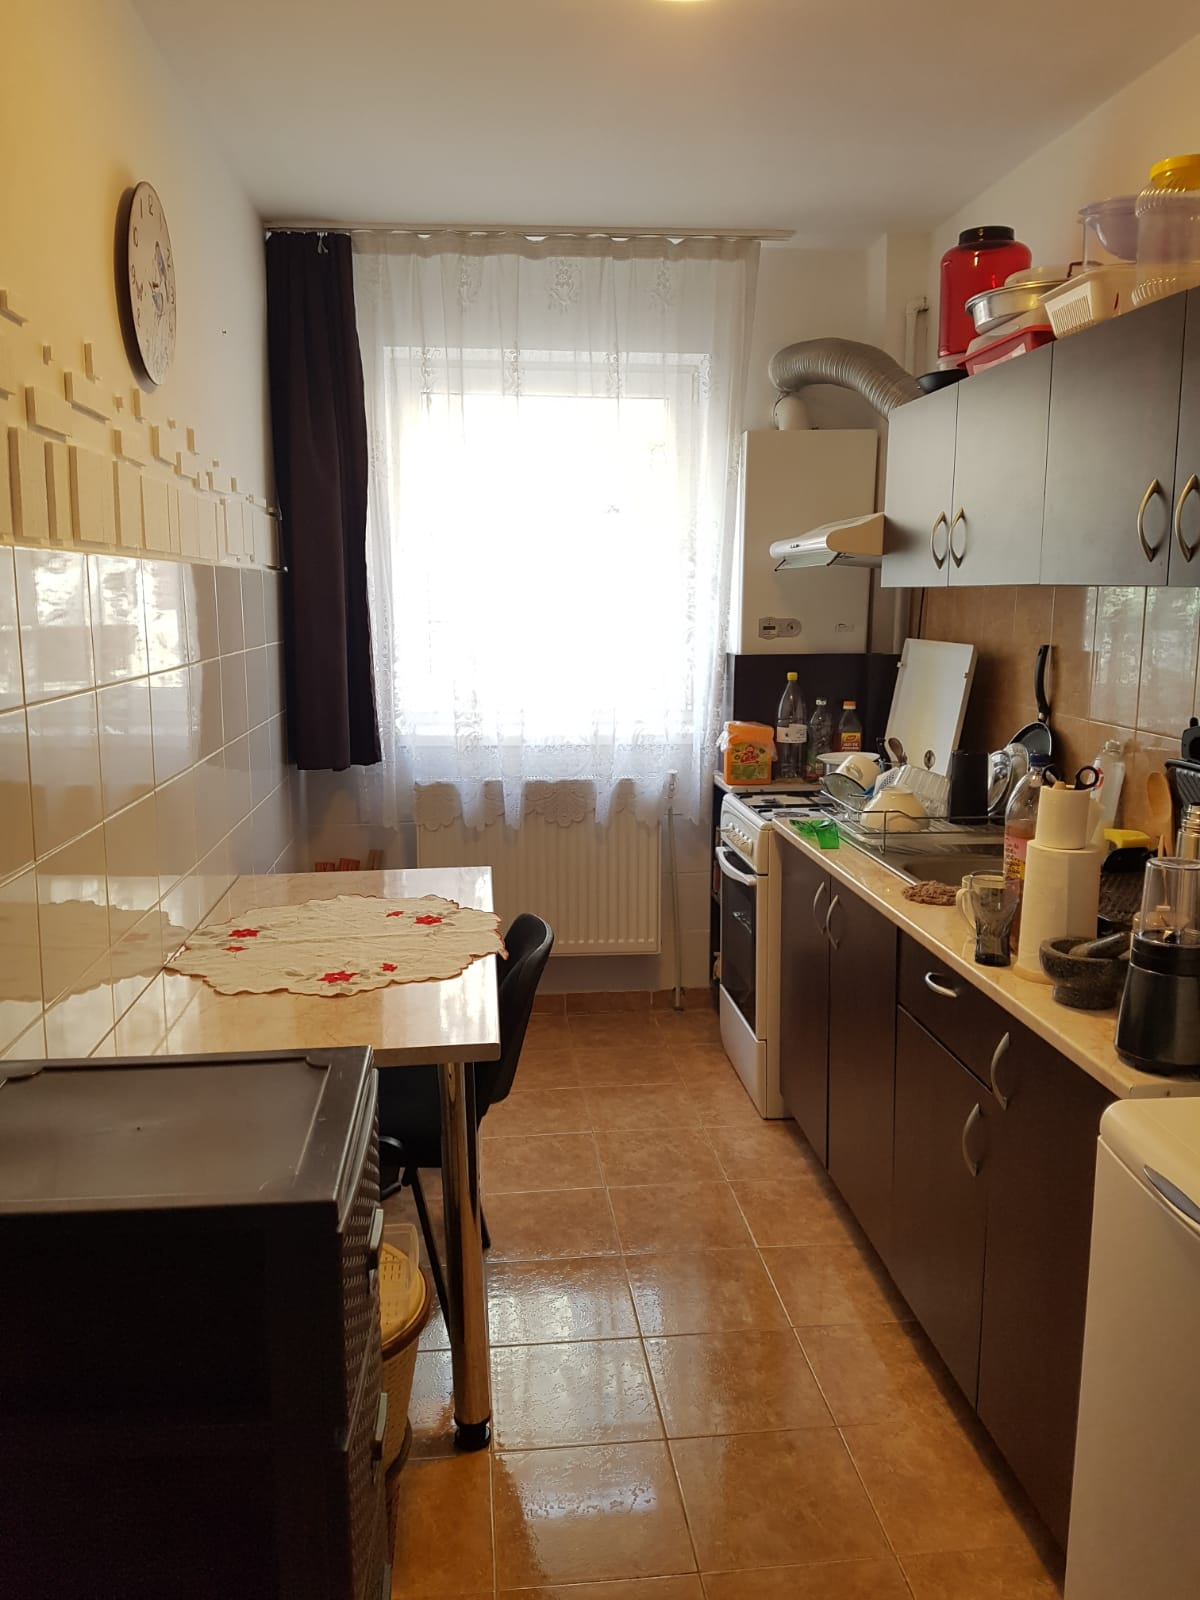 180493-Apartament de vanzare, 3 camere, Floresti